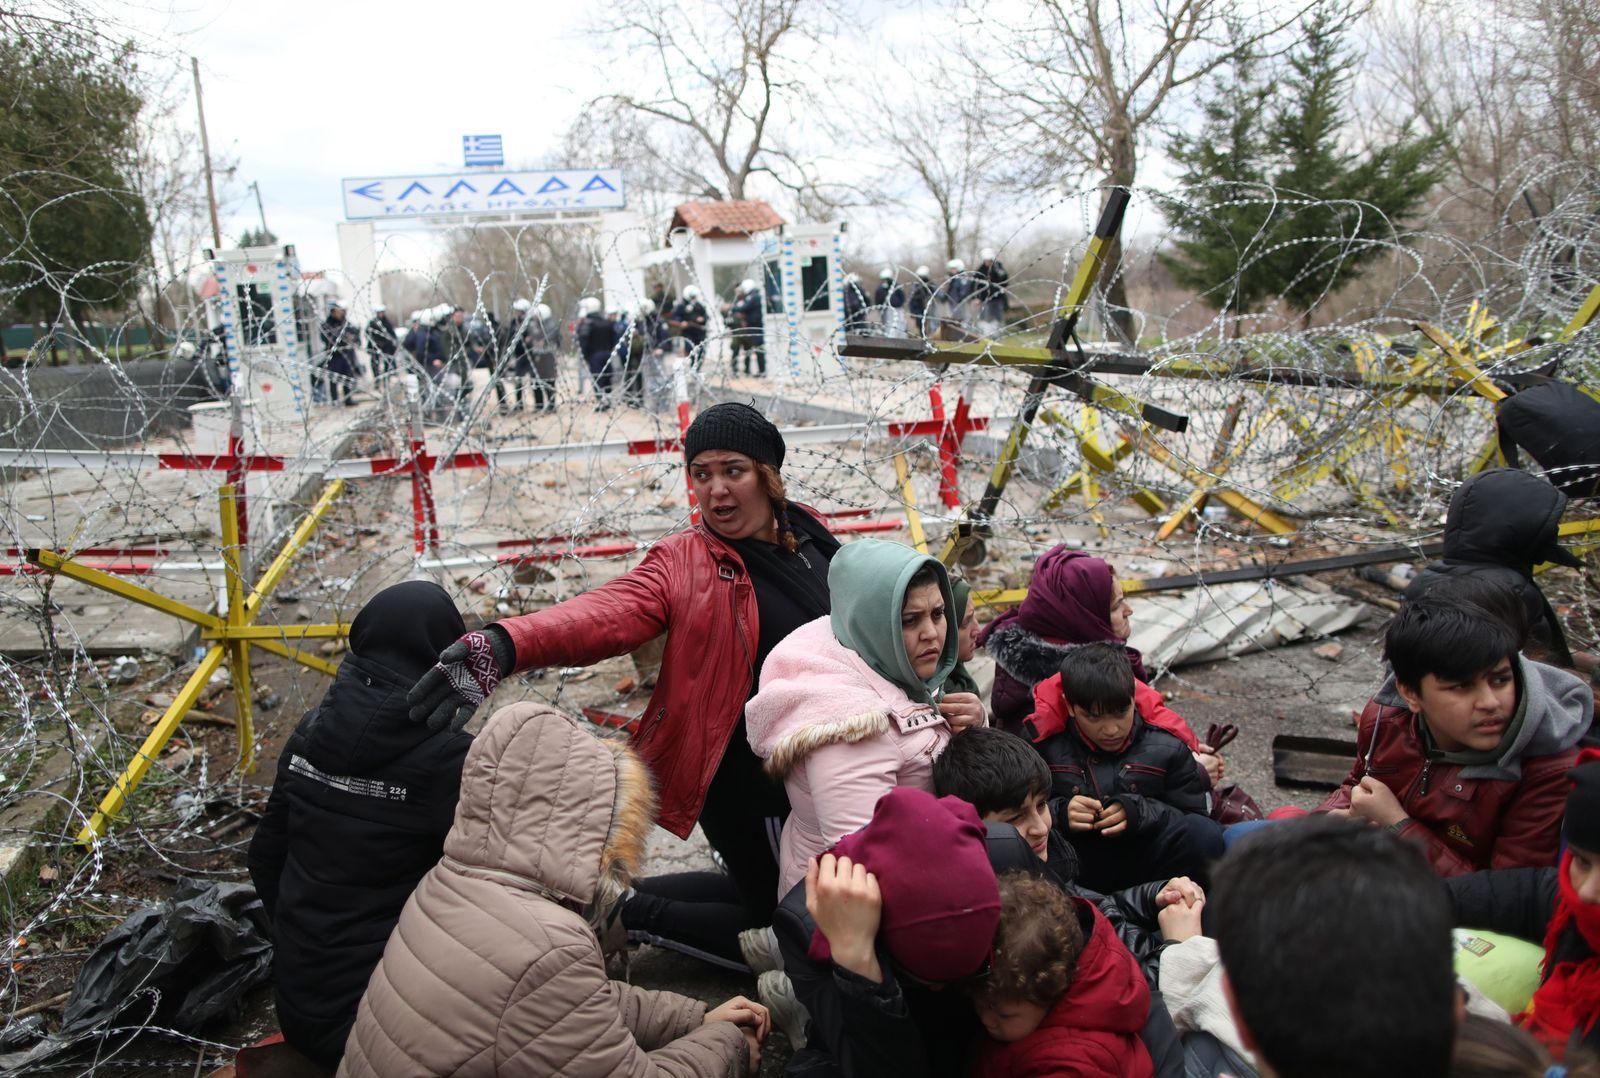 Refugees and migrants gather at Turkish-Greek land border, Edirne, Turkey - 29 Feb 2020